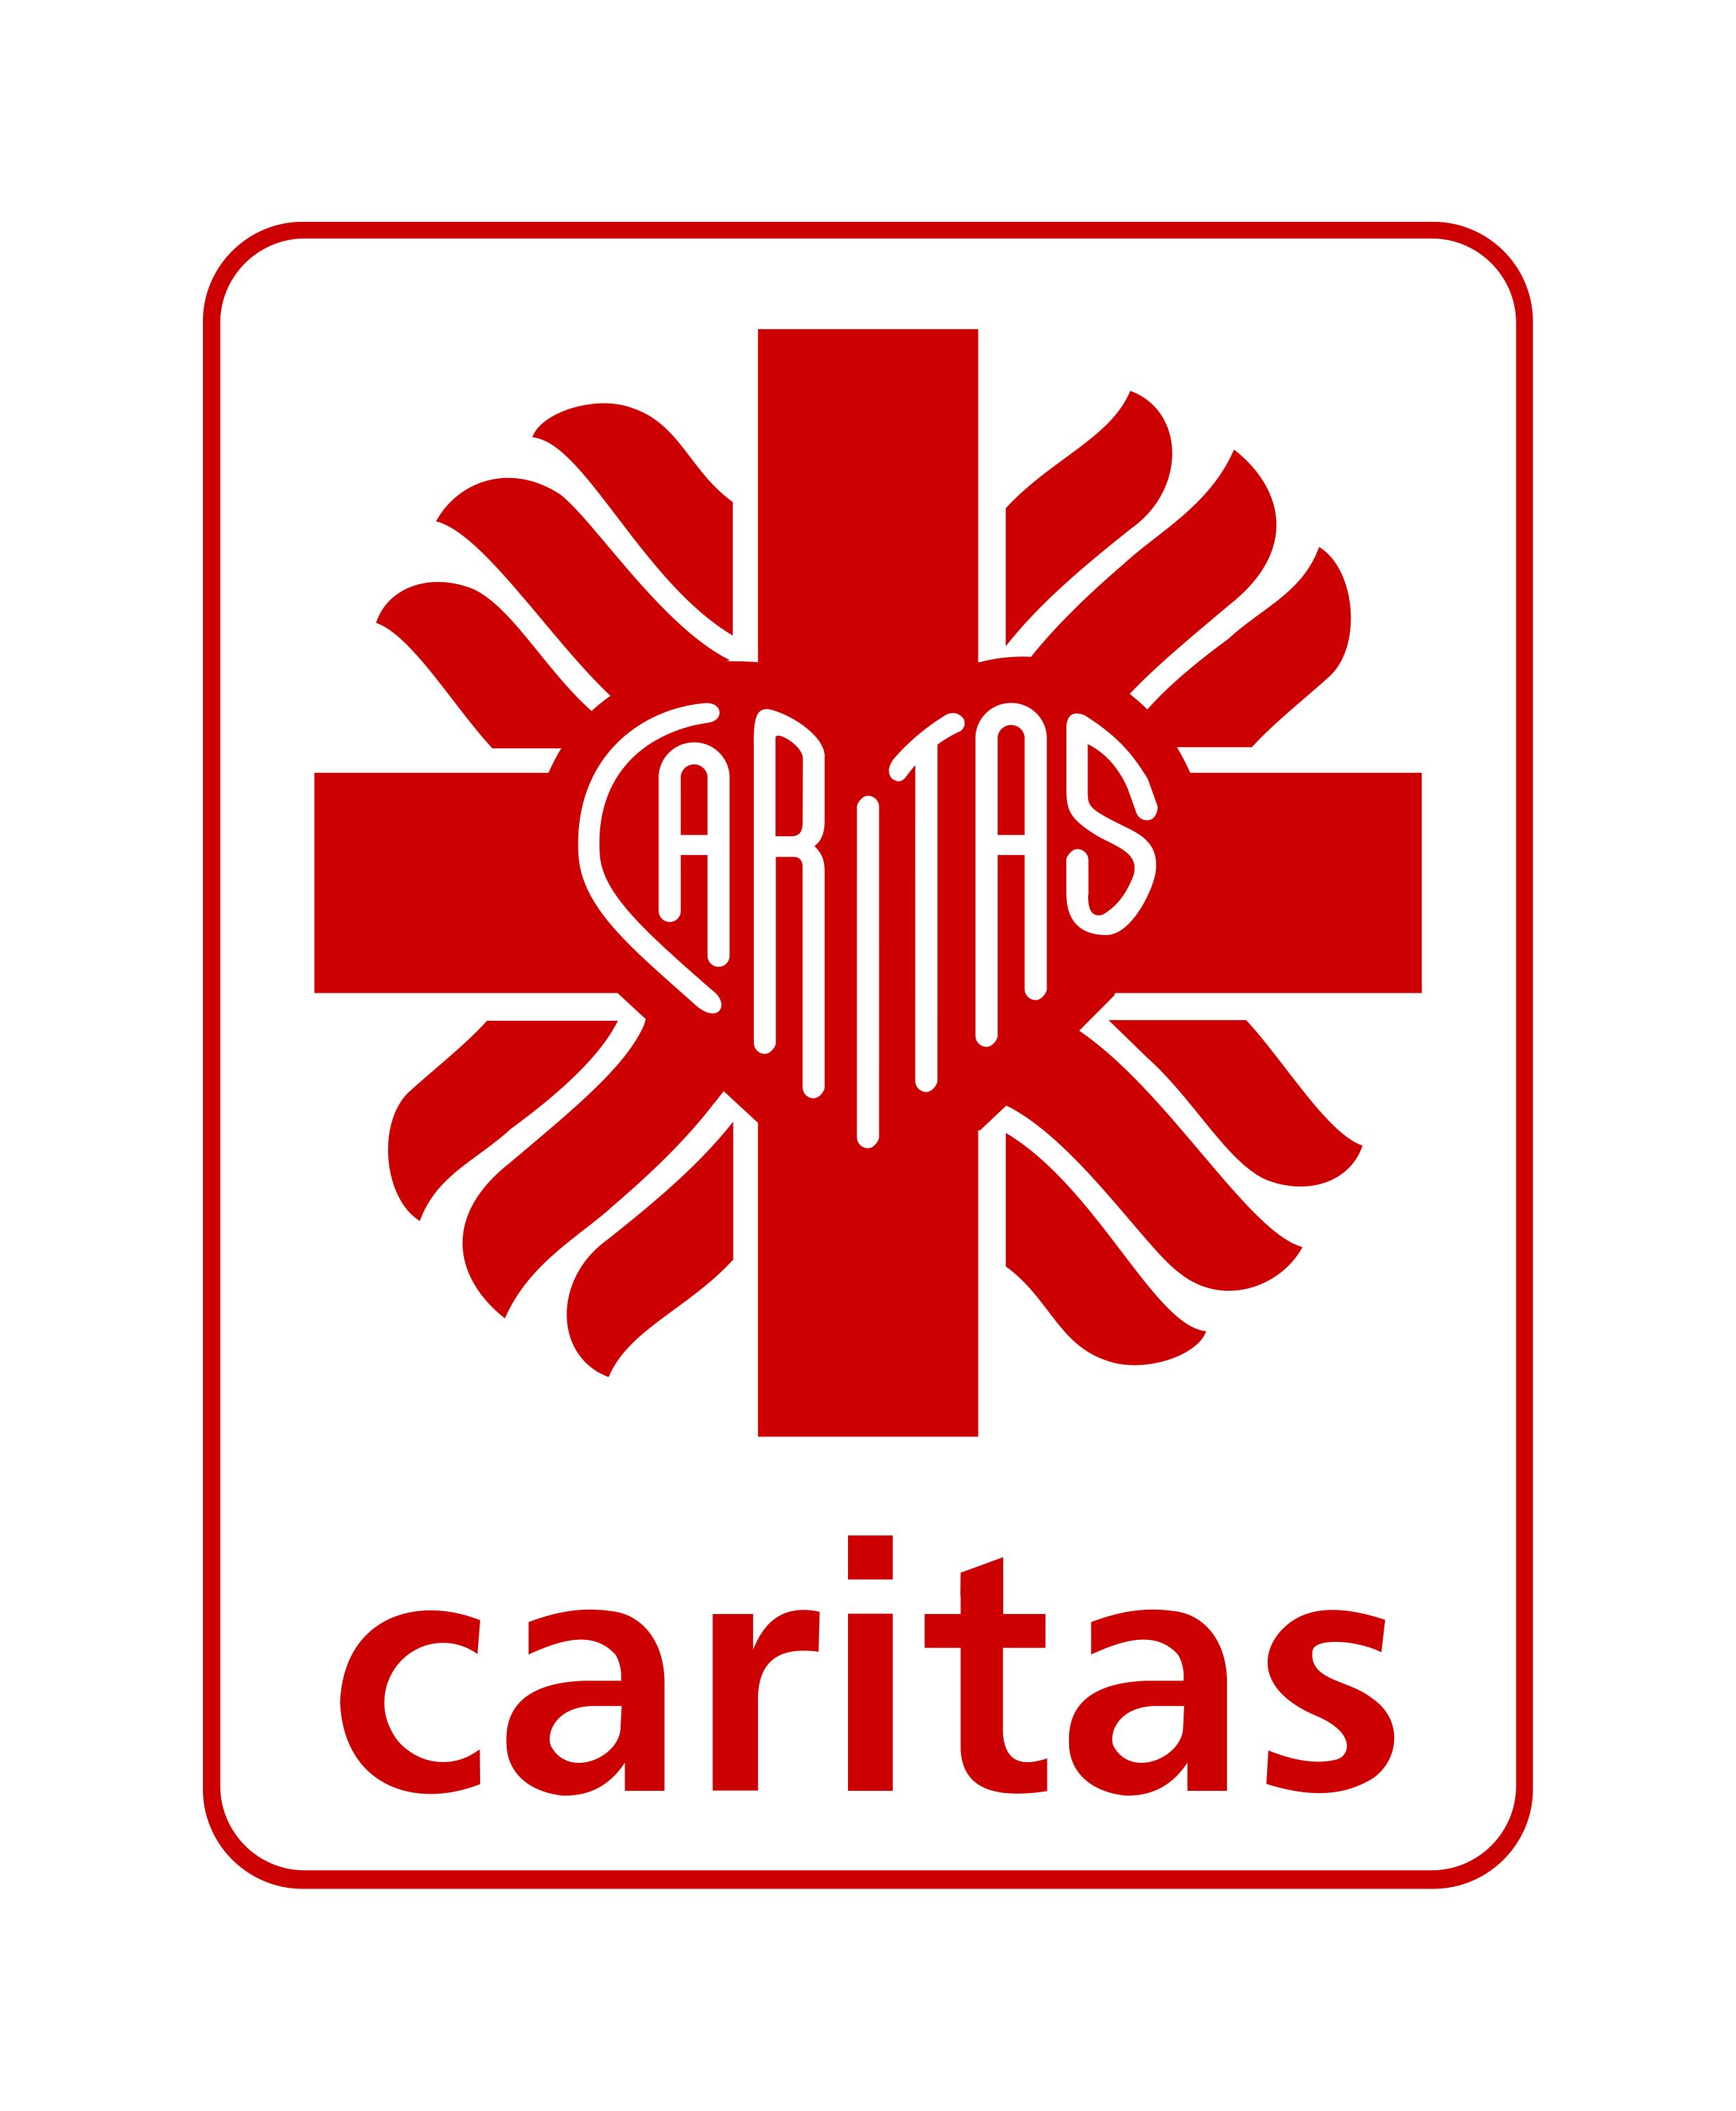 logo_caritas_new_cmyk.jpg